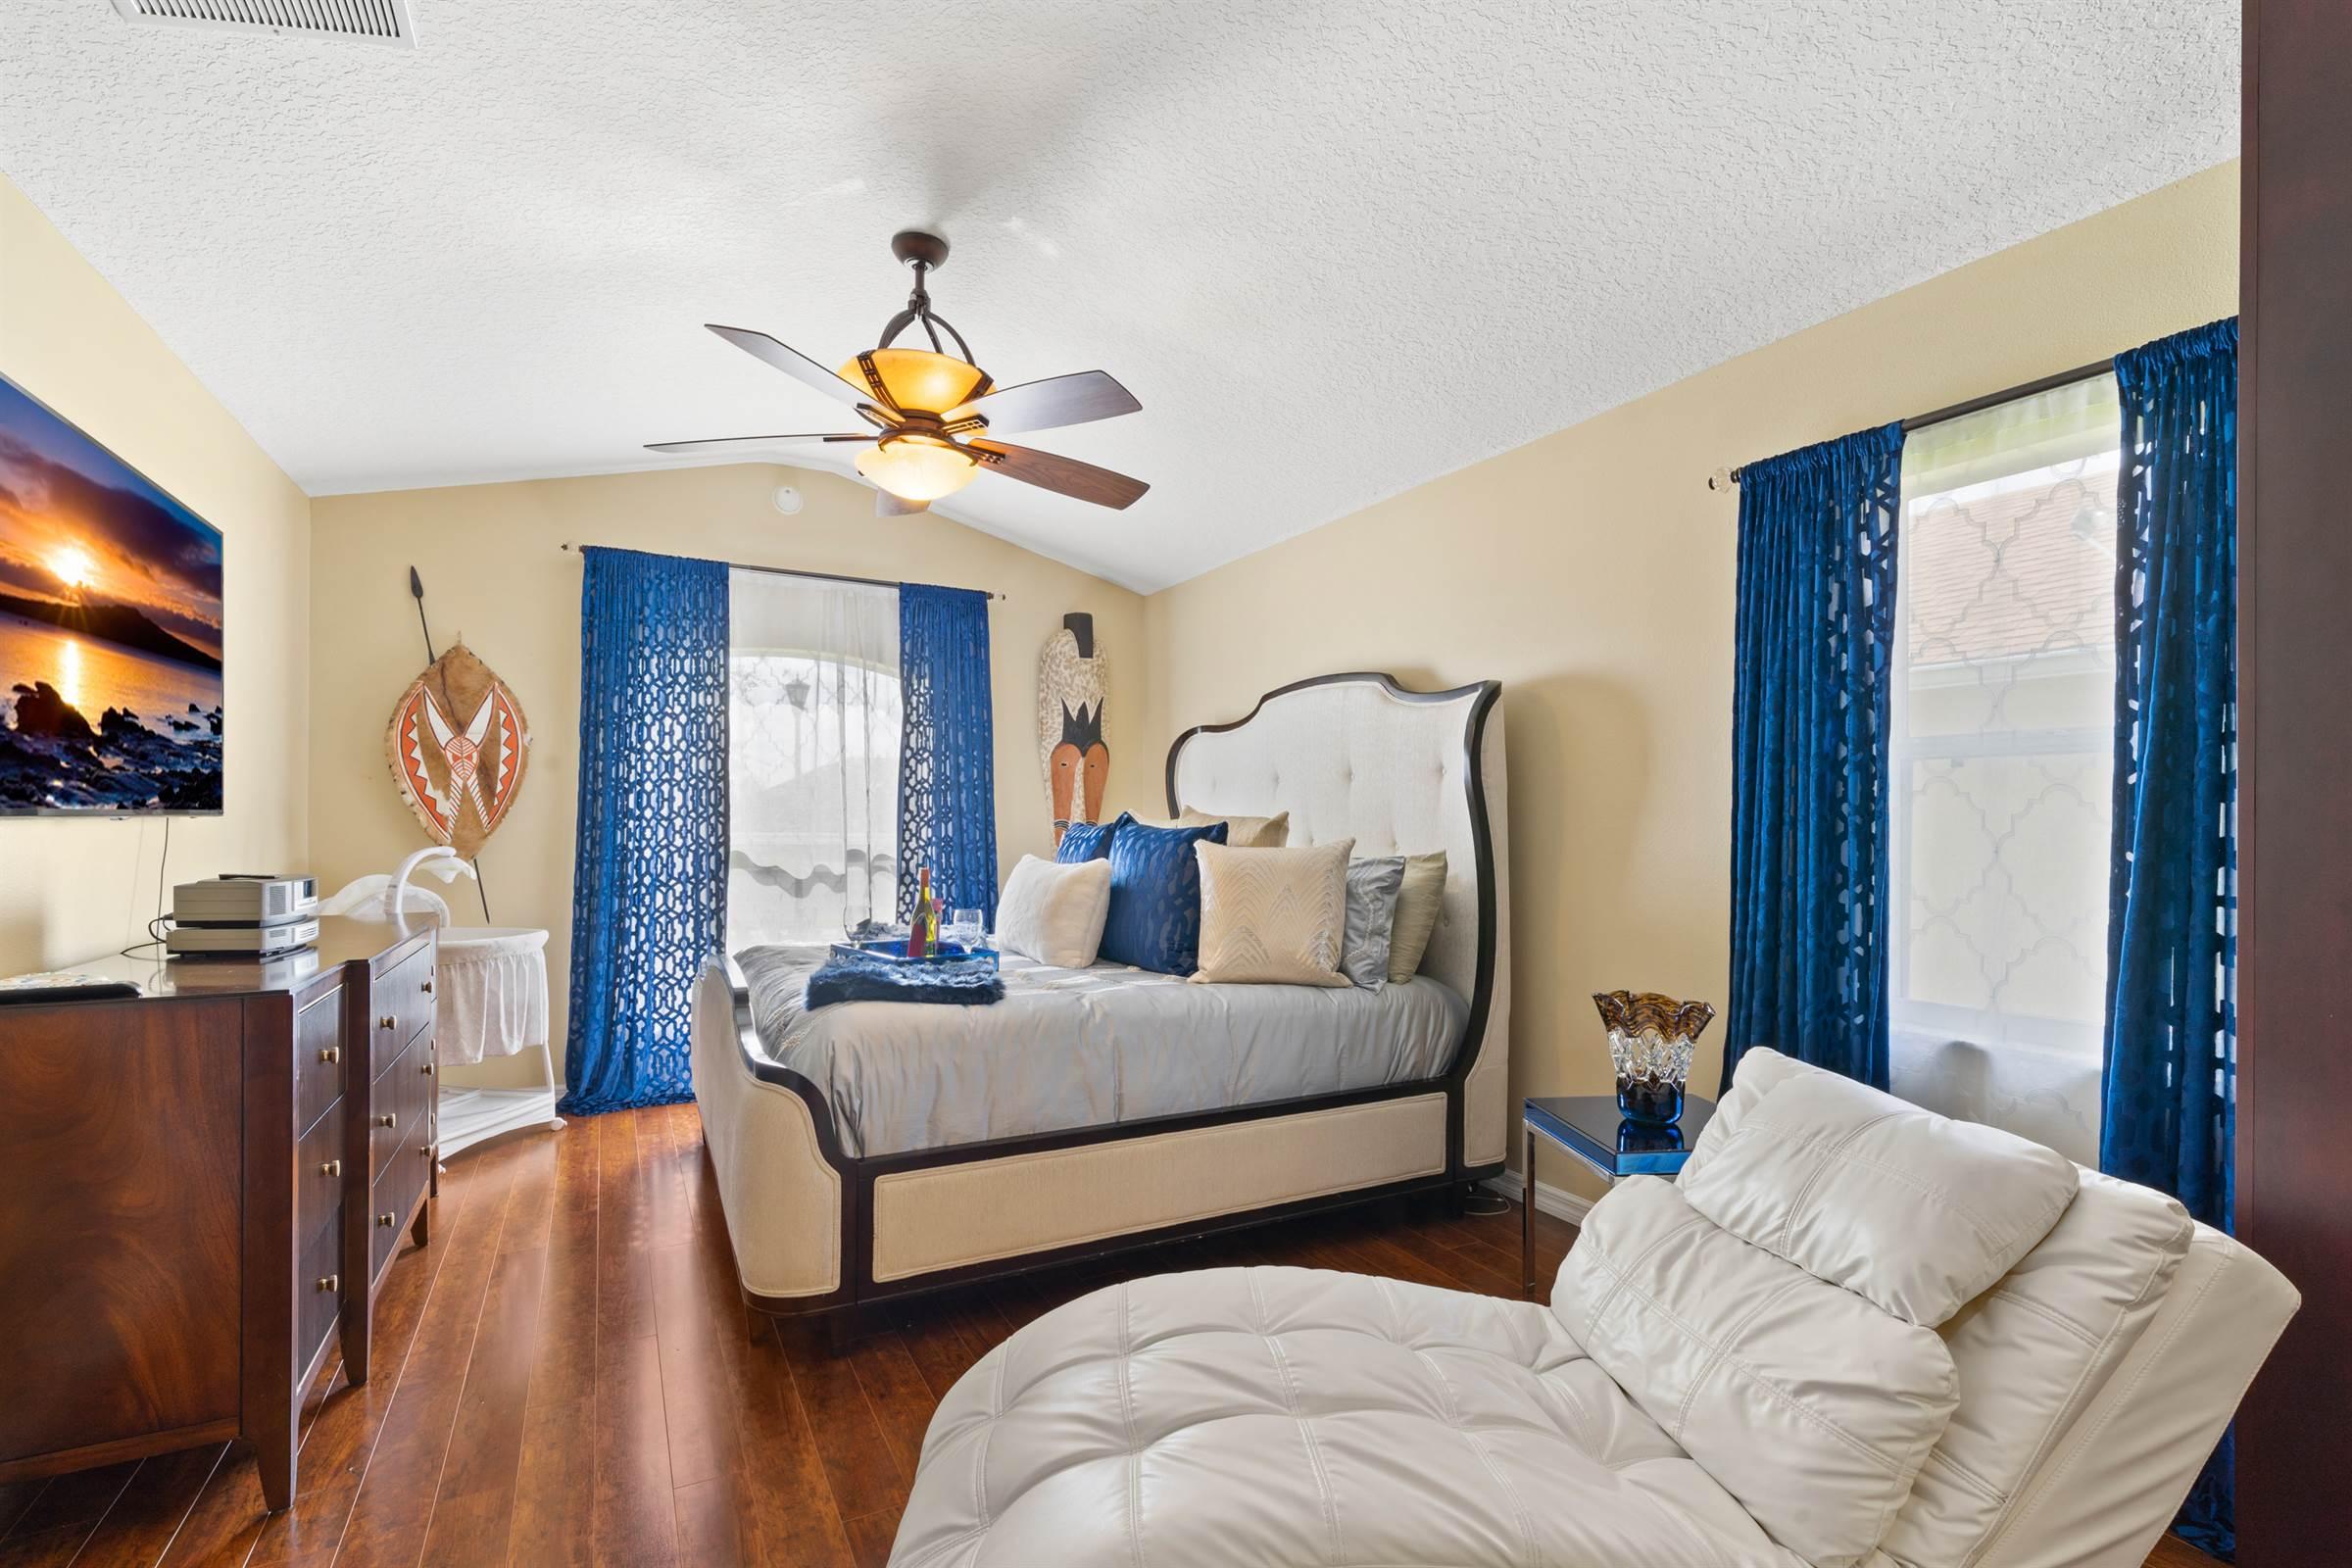 503 Lake Sumner Drive, Groveland, FL 34736